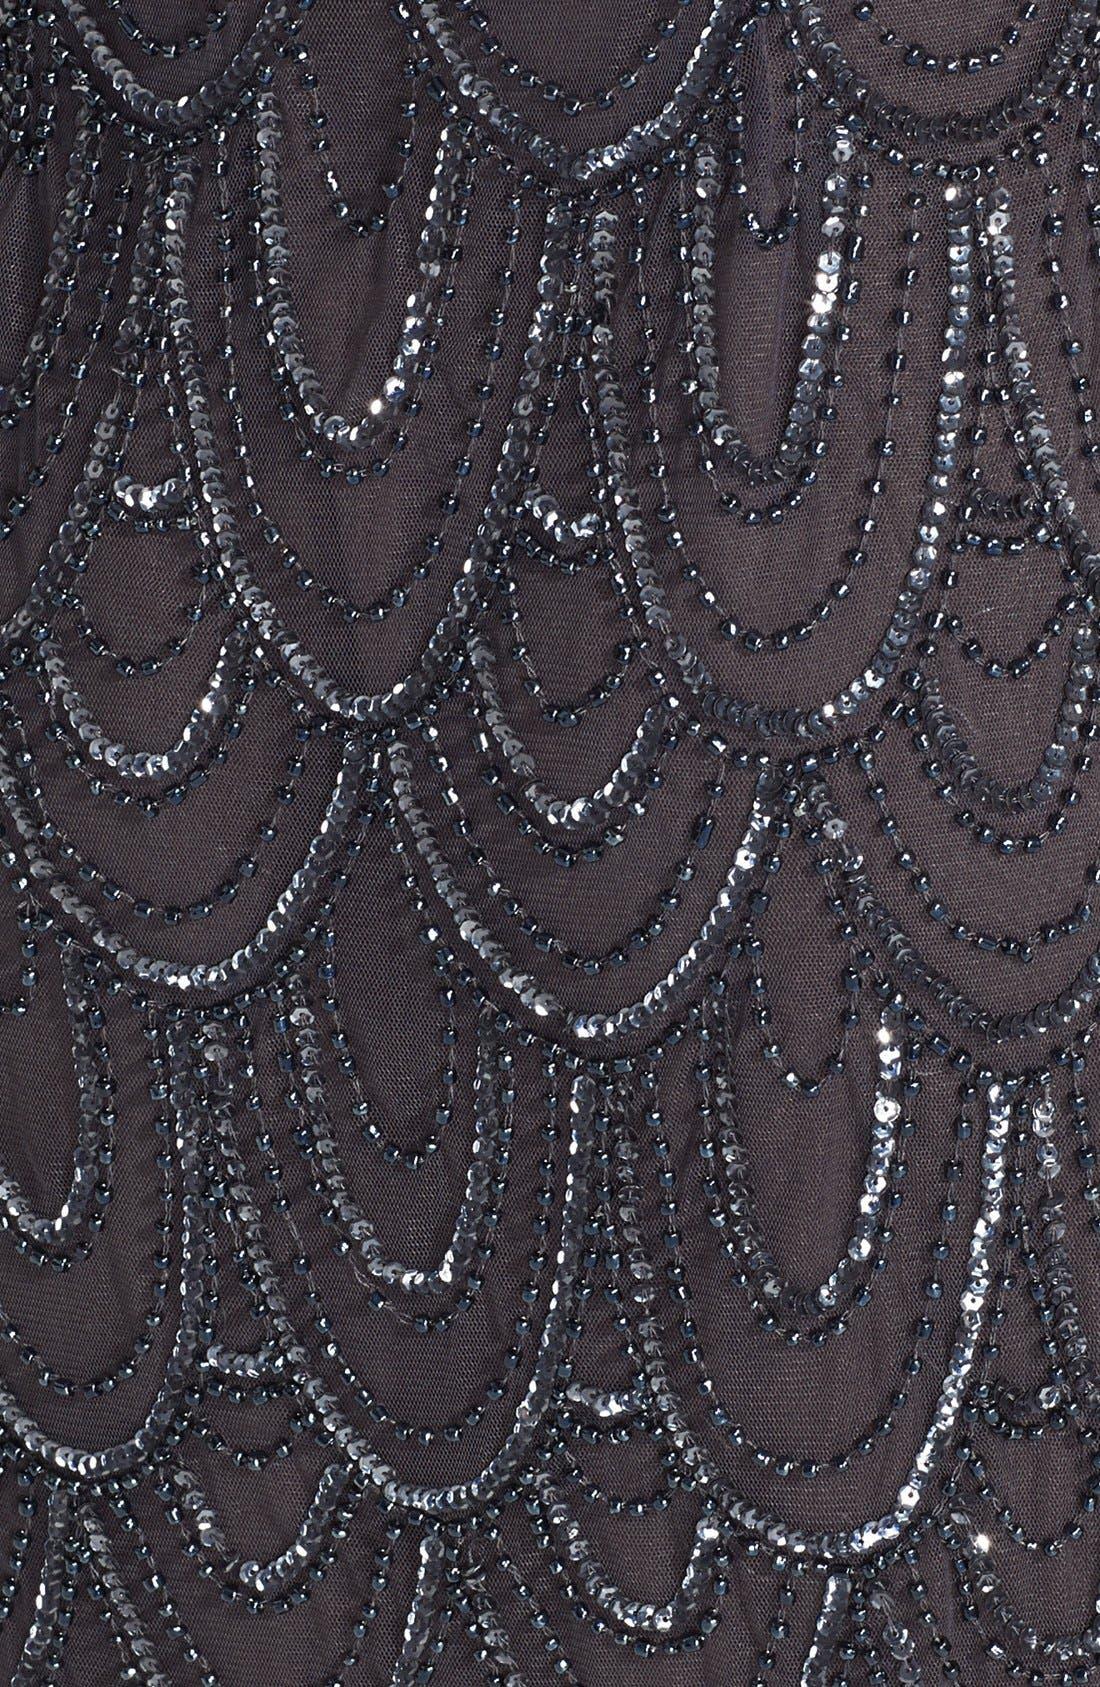 Embellished Mesh Sheath Dress,                             Alternate thumbnail 67, color,